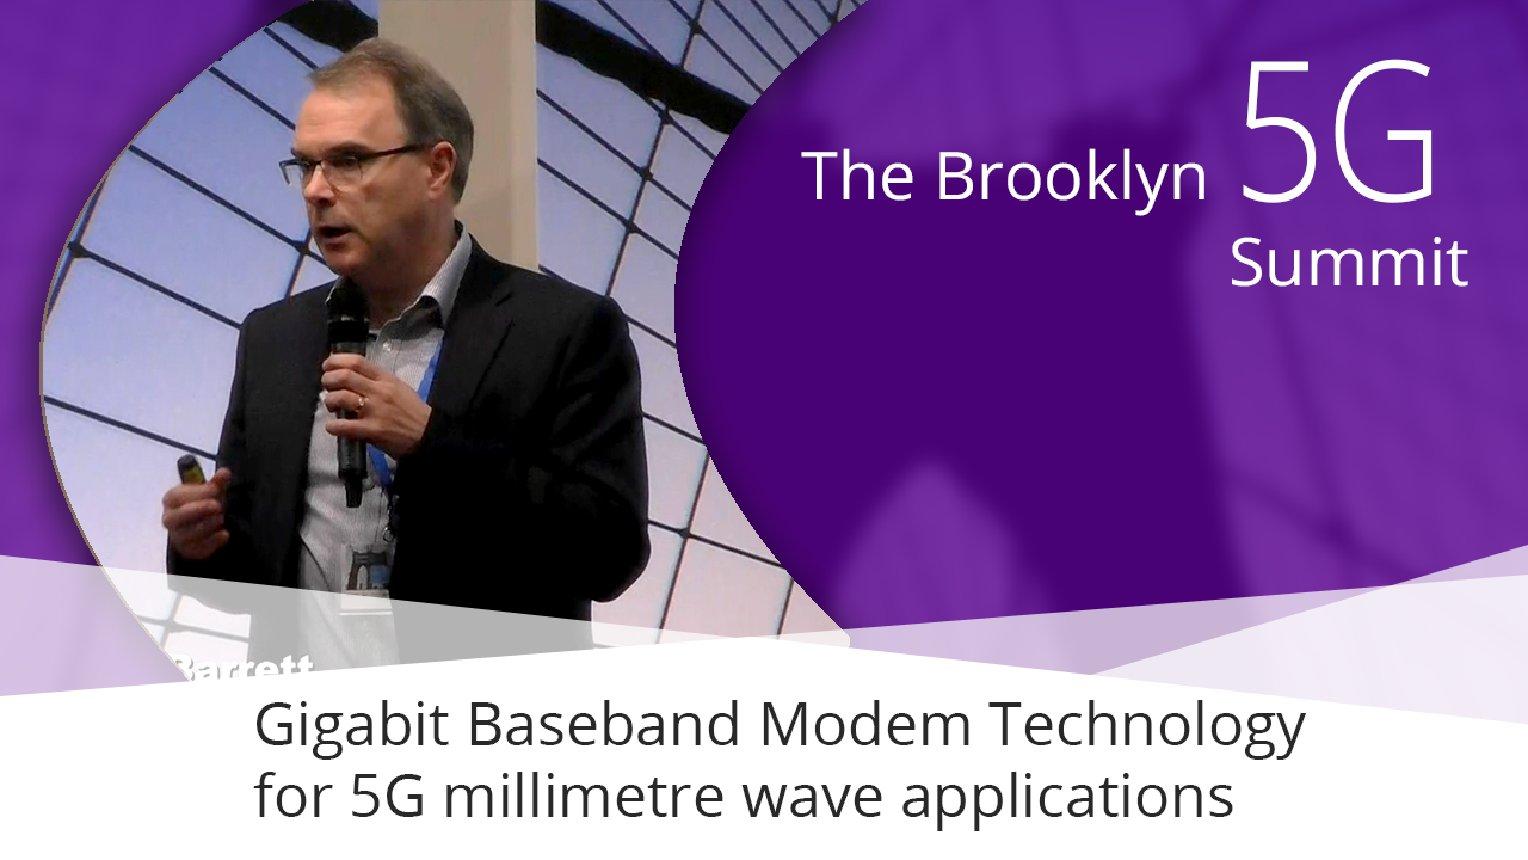 Gigabit Baseband Modem Technology for 5G millimetre wave applications - Mark Barrett: Brooklyn 5G Summit 2017